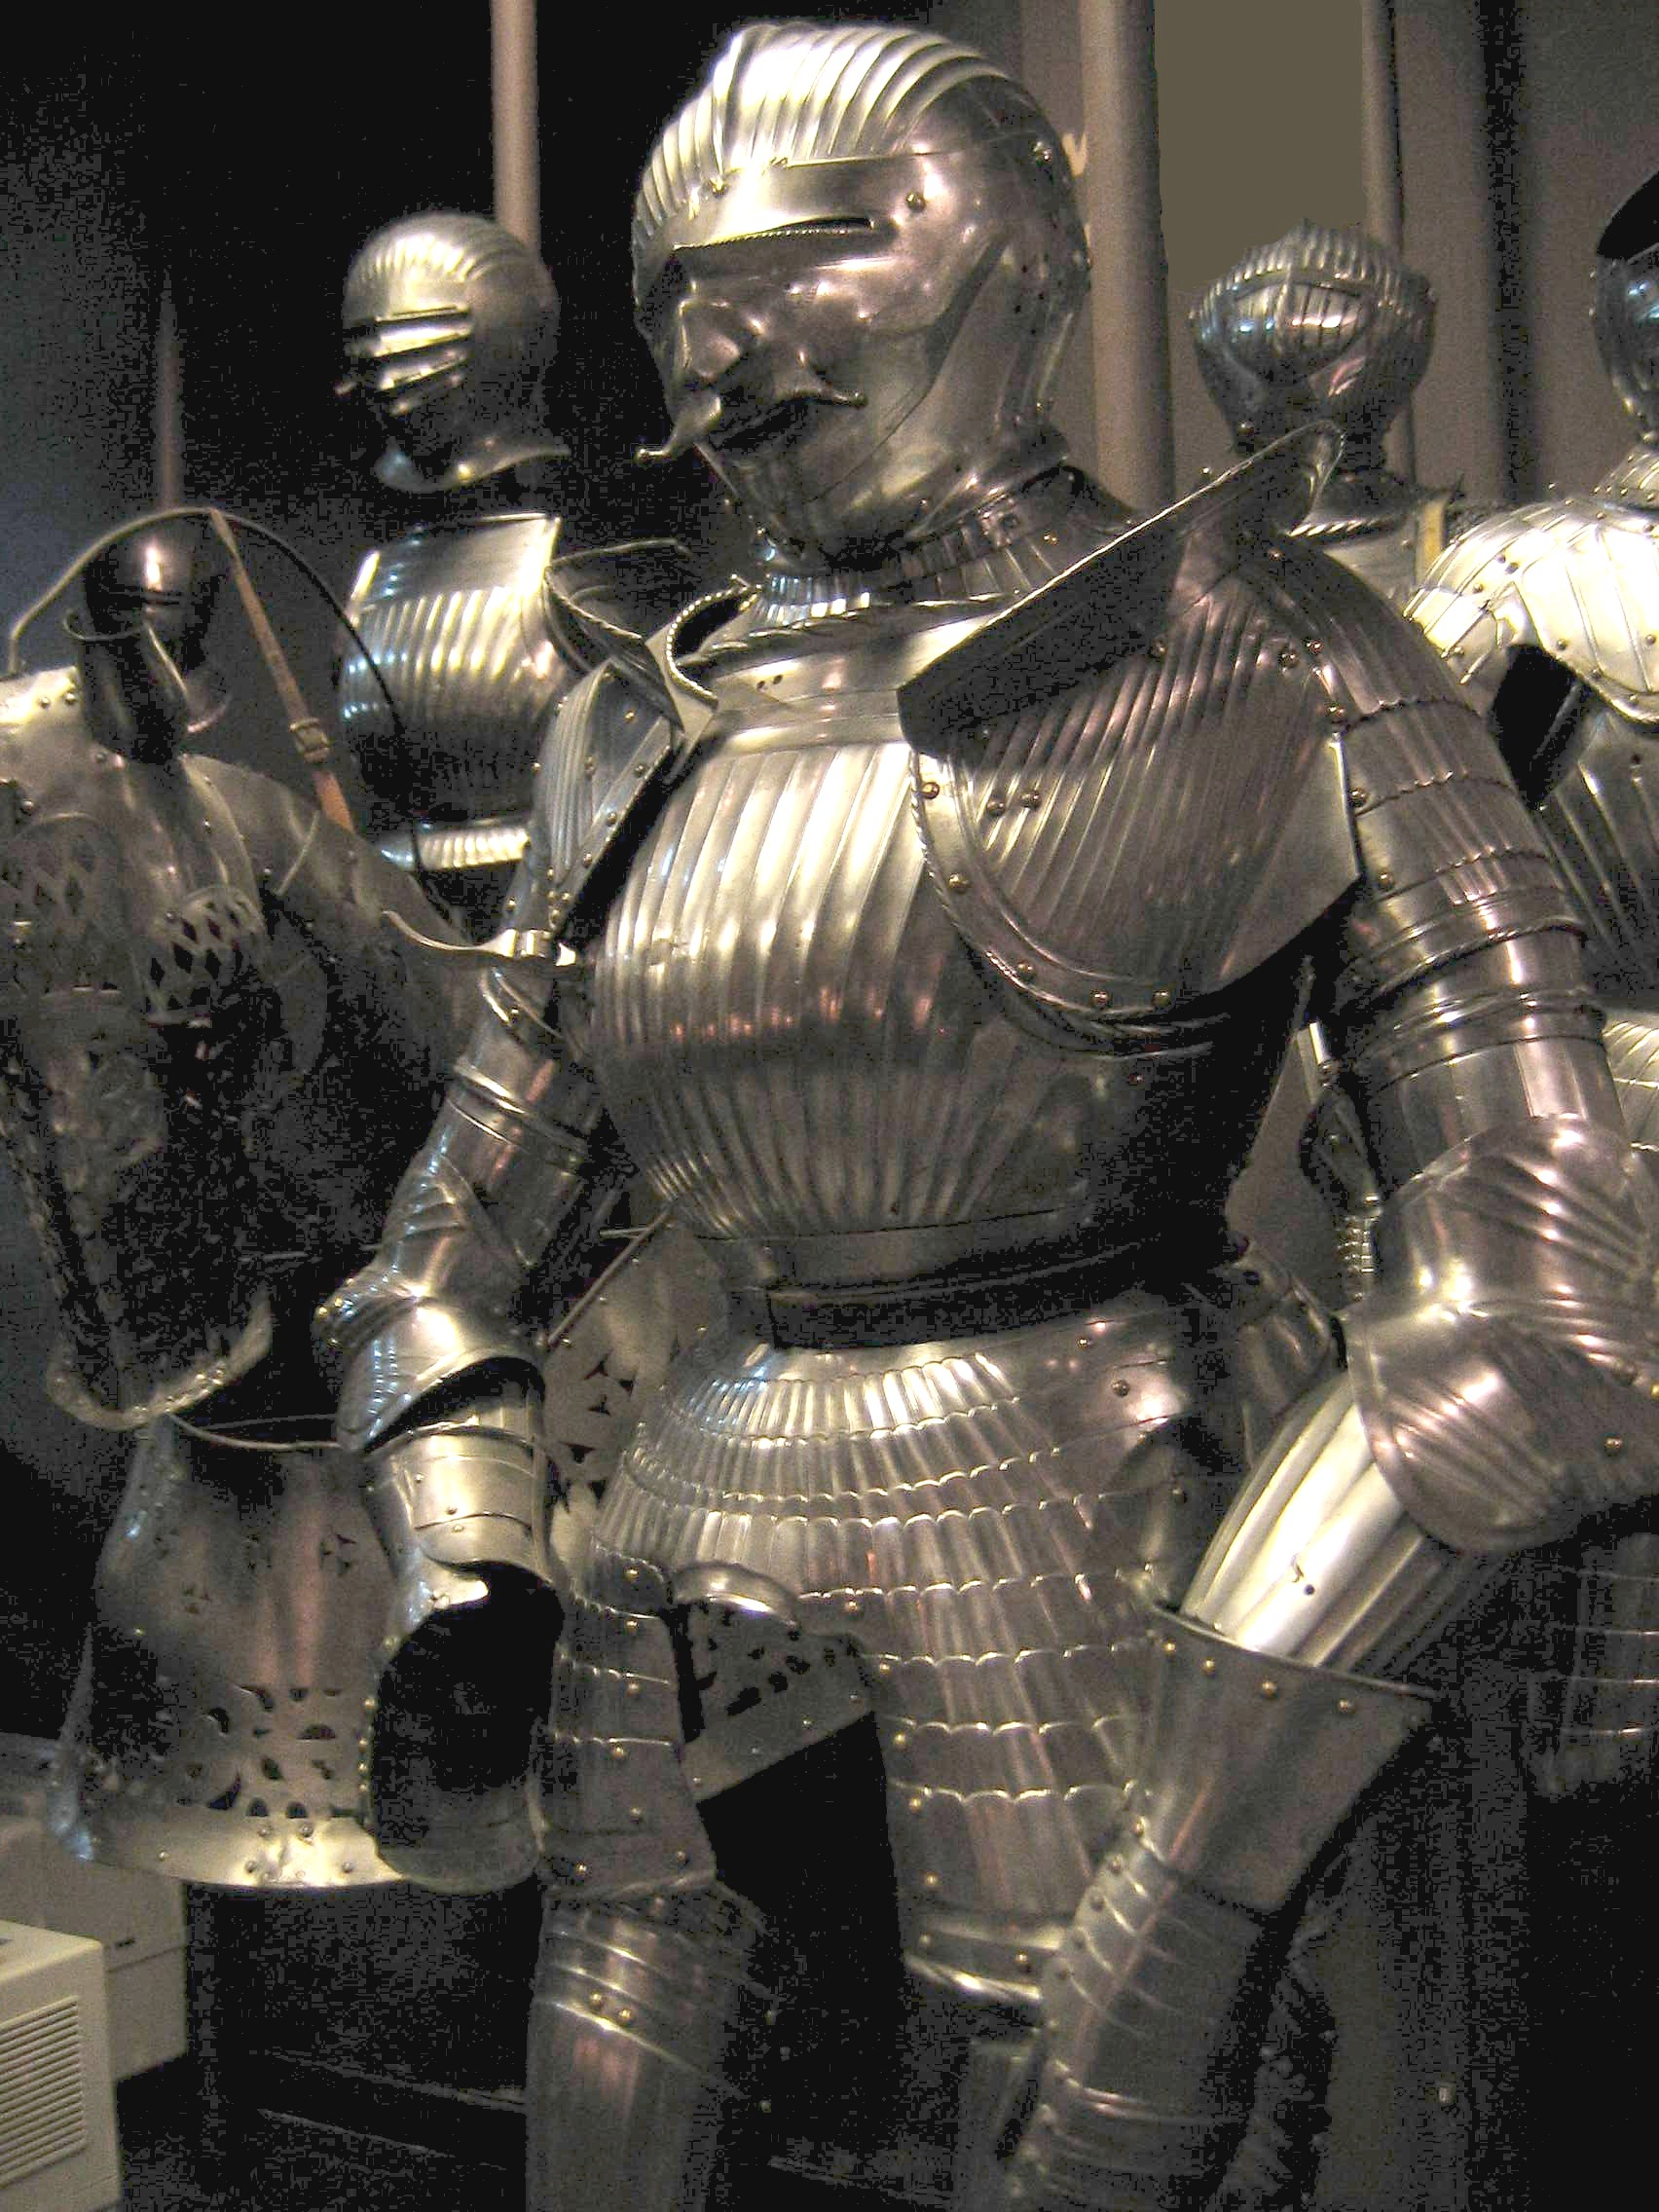 File:Zbroja 1514.JPG - Wikimedia Commons